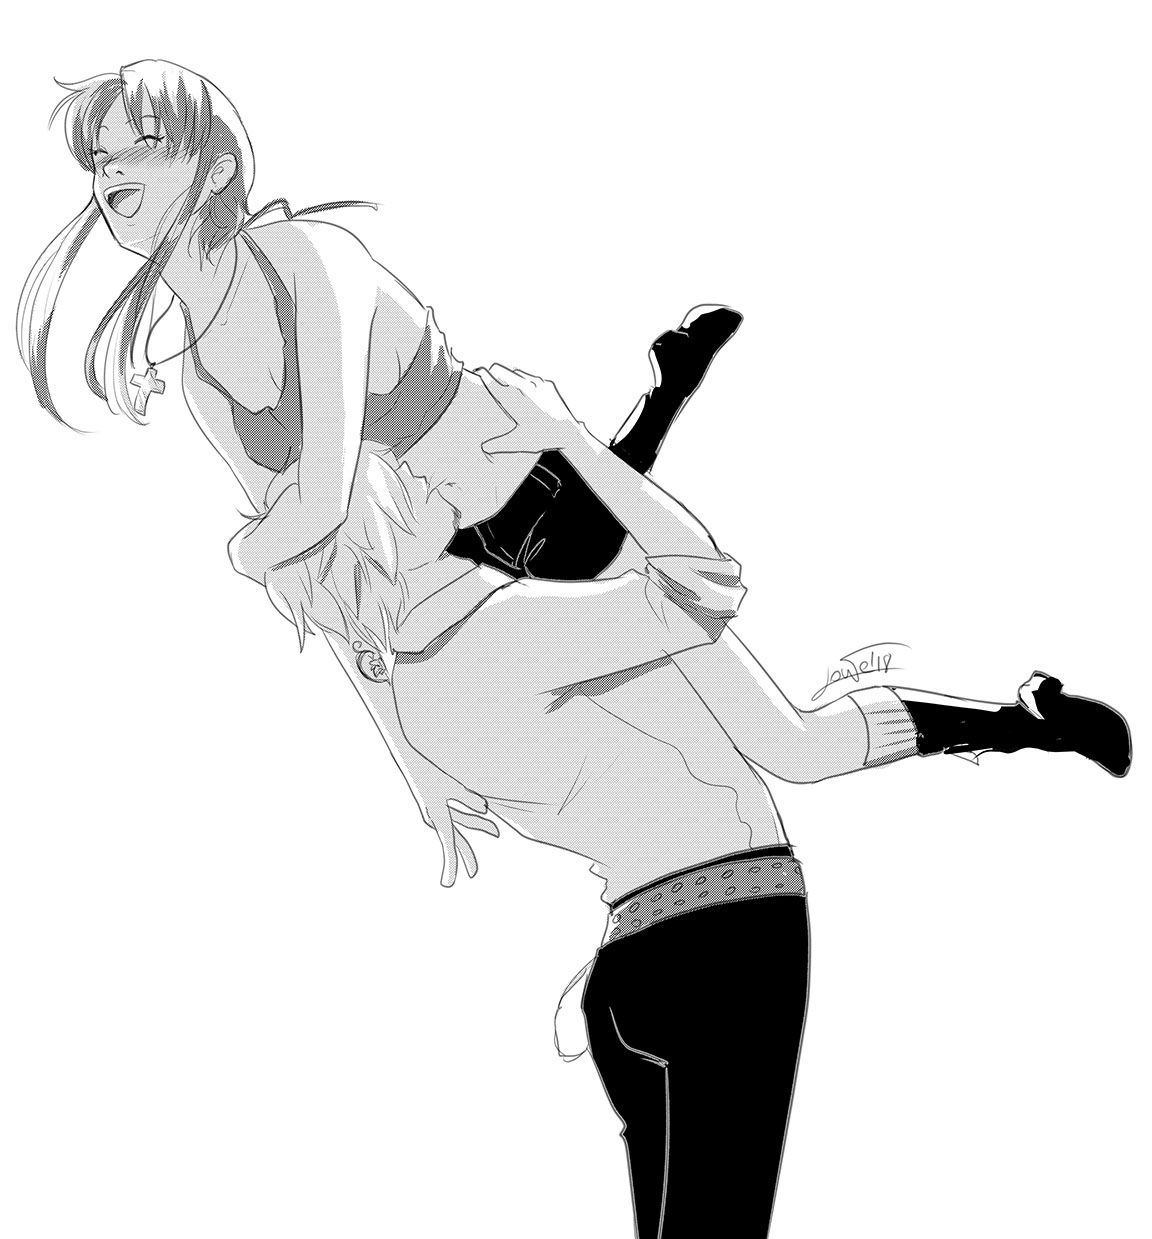 Original character created just to love Sanji-kun 💛💜  #sanji #sanjivinsmoke #lowe #lowemihawk #oc #originalcharacter #opoc #canonxoc #onepiece #onepiecefan